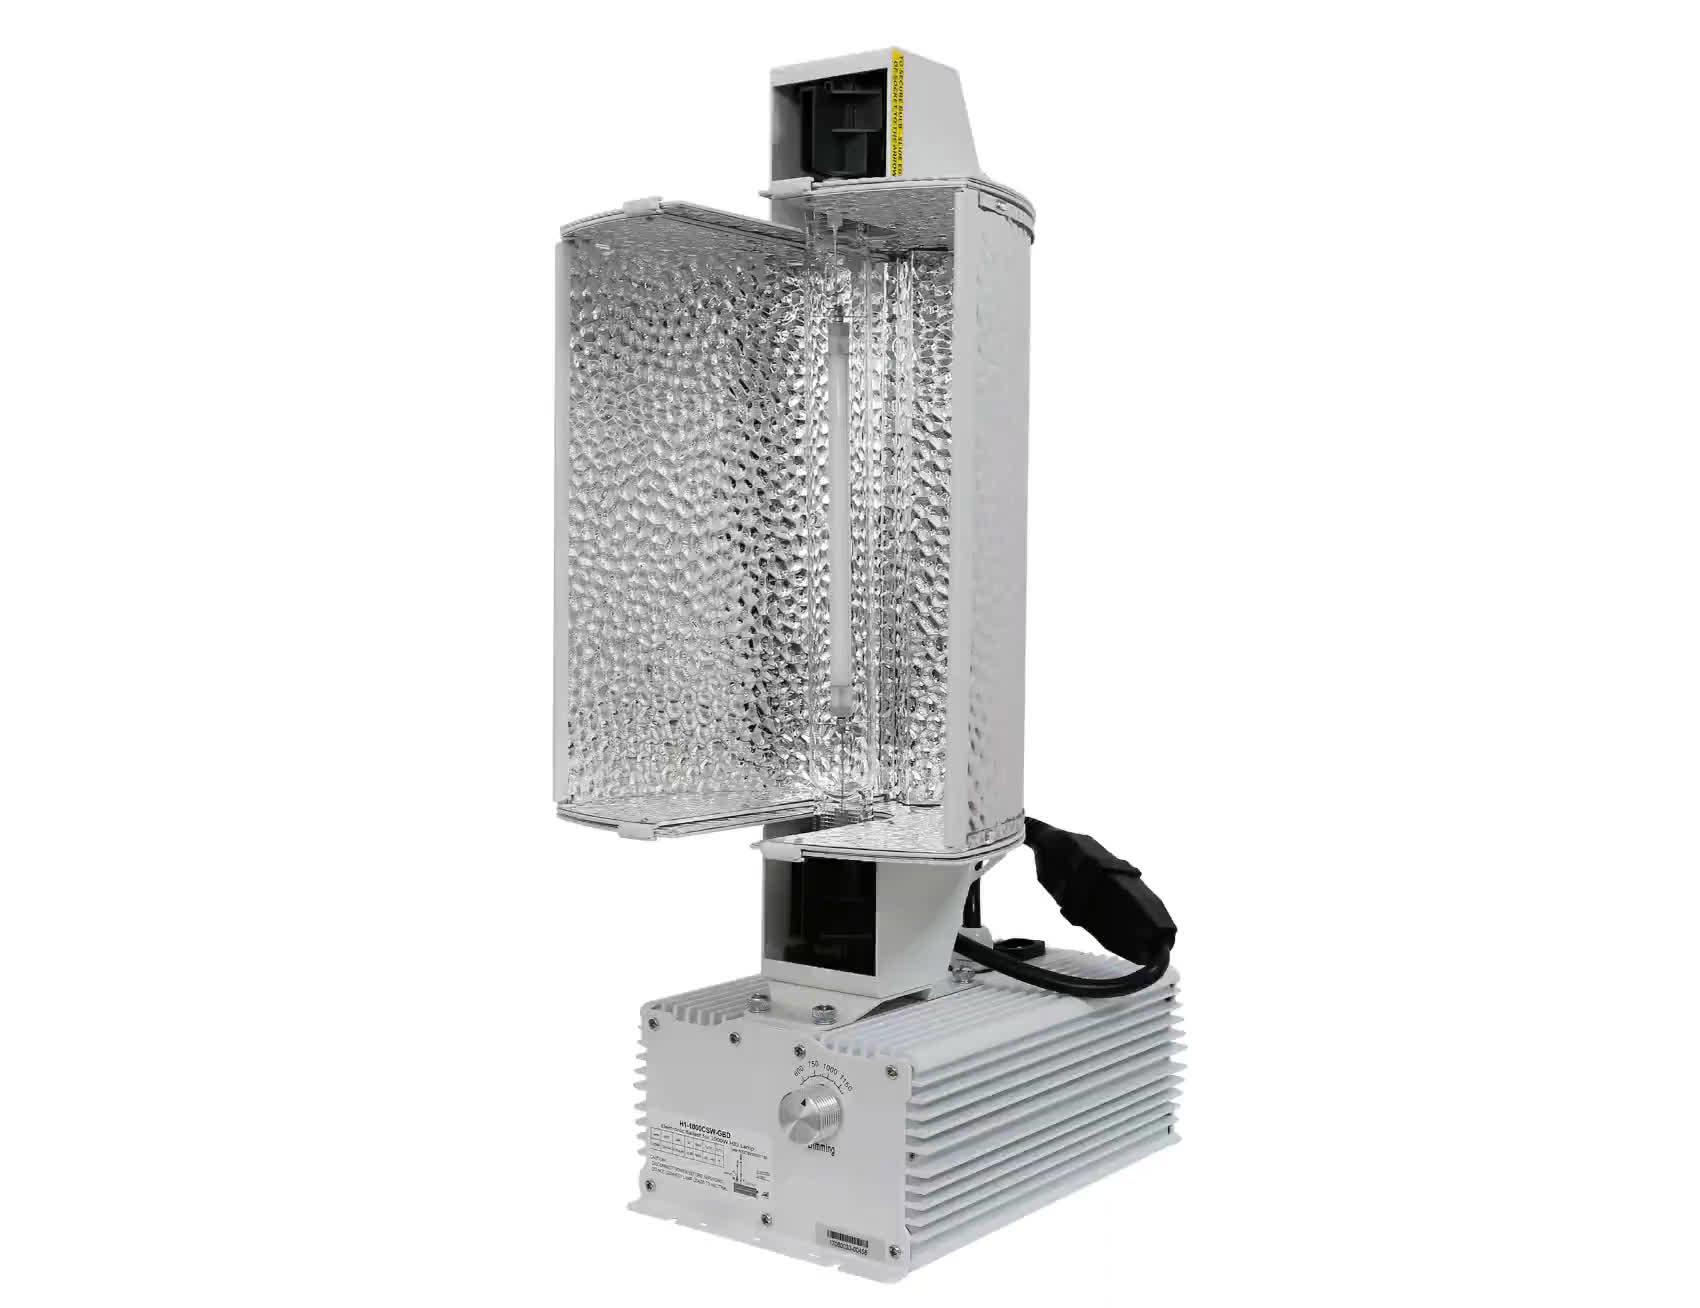 Patentierte Design ETL Zertifiziert FlexStar Stufenlos Einstellbar 1000 watt Doppelseitige DE Komplette System Reflektor Leuchte Haube